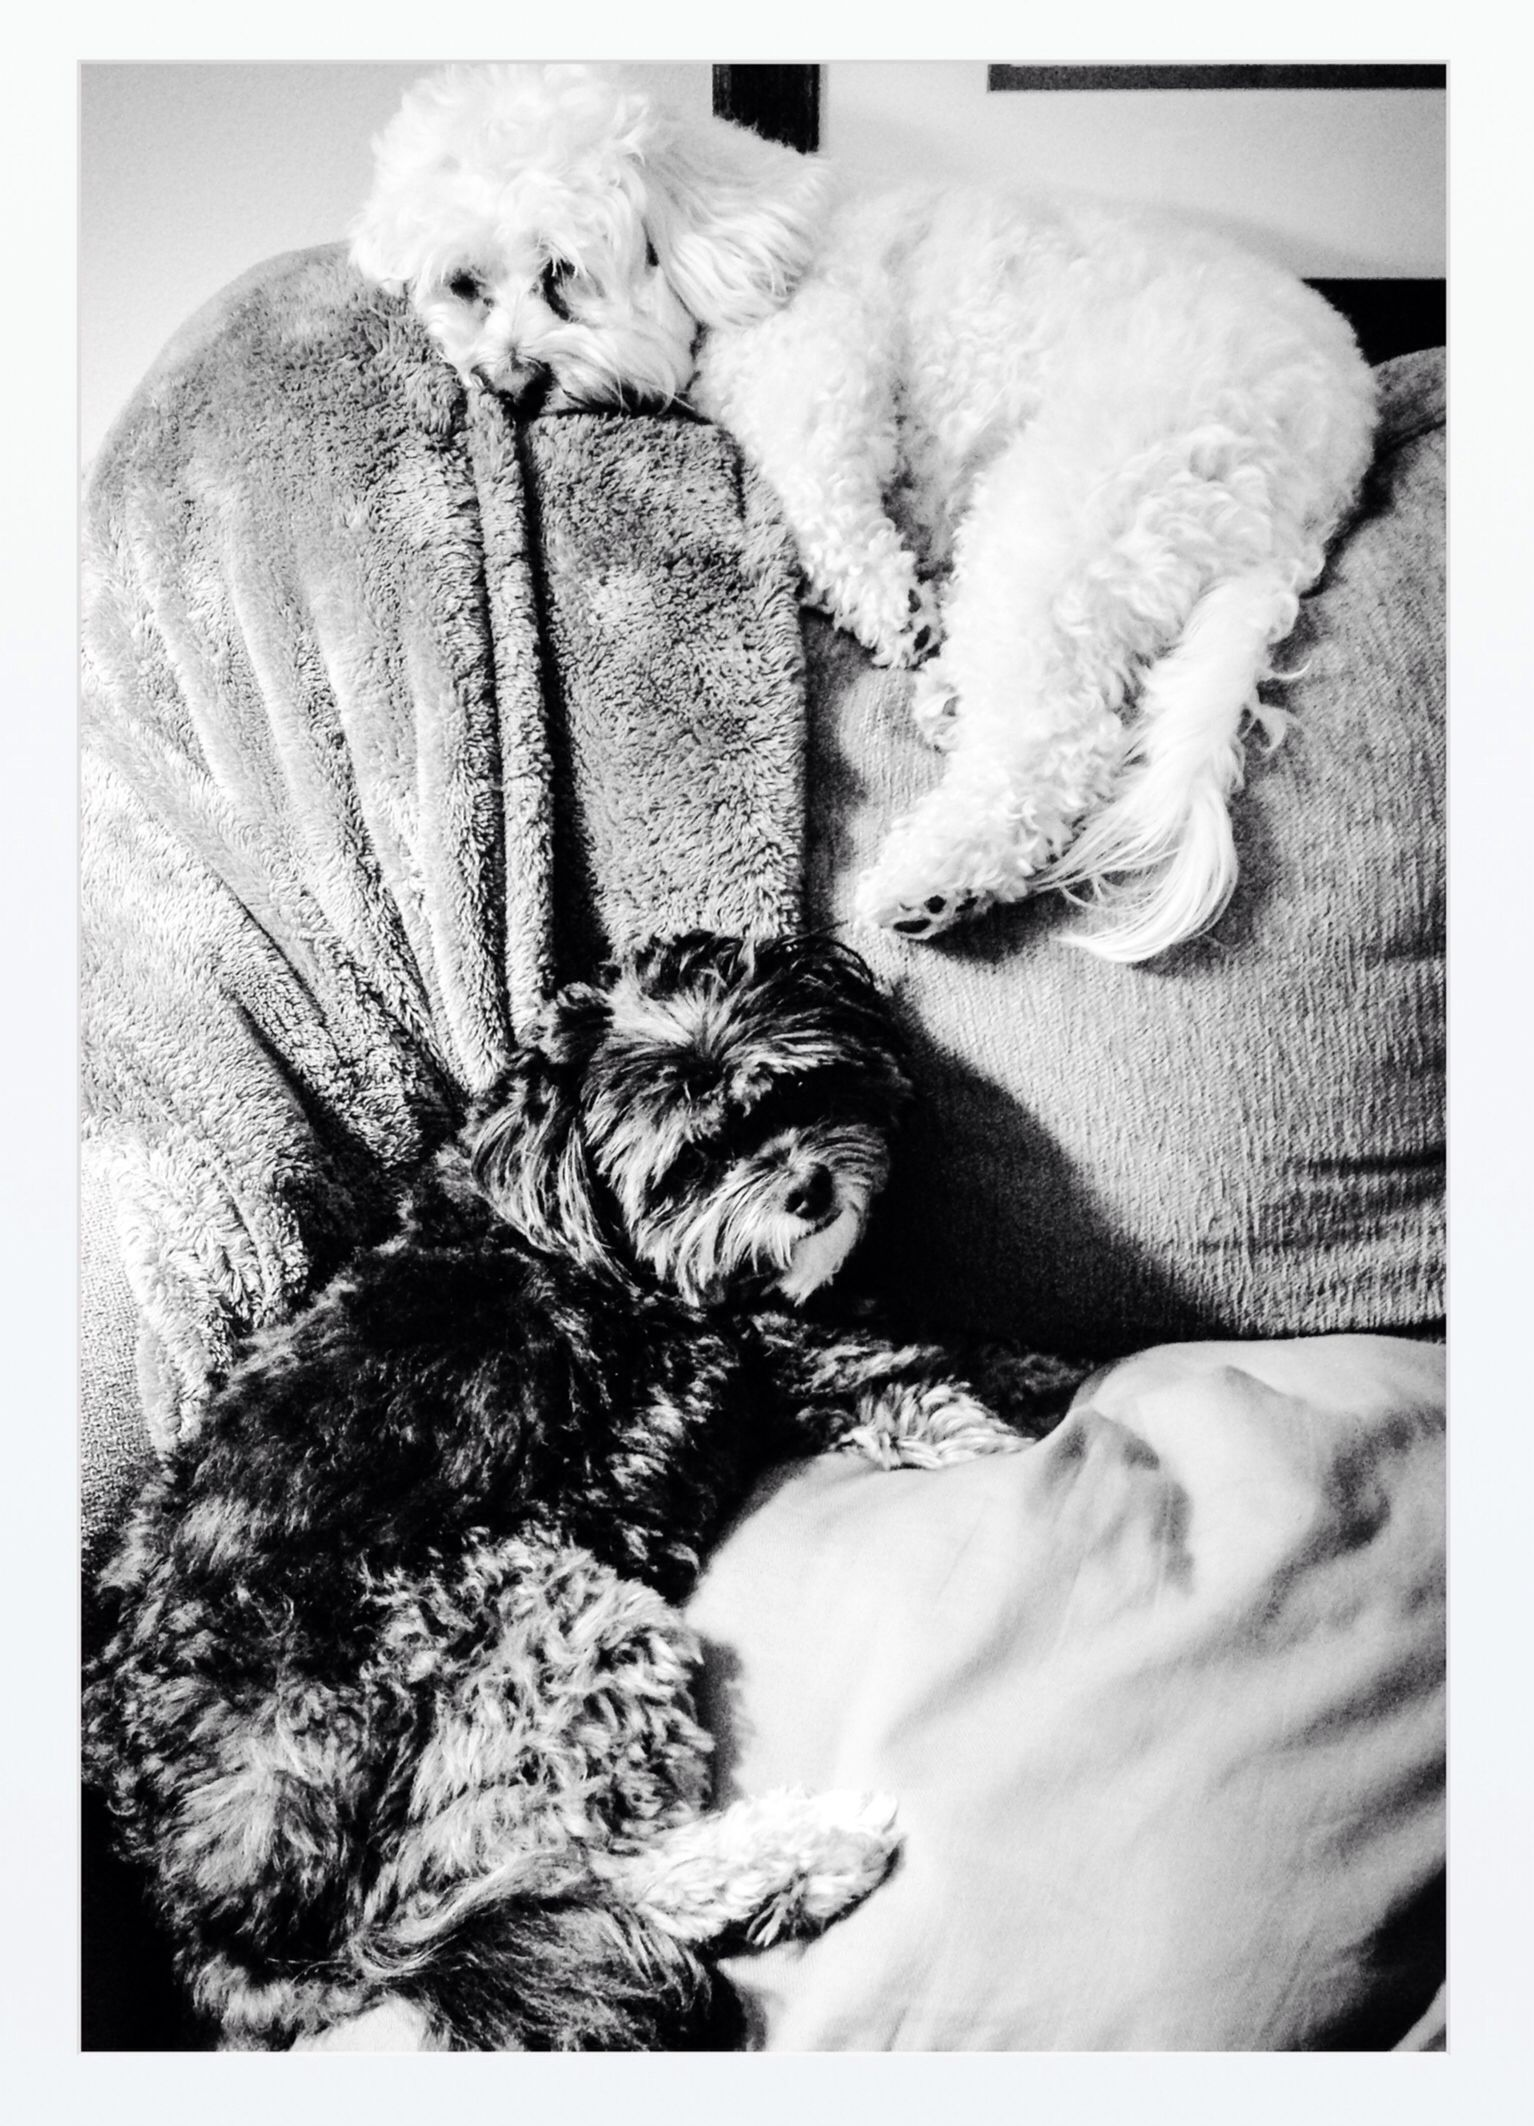 Lazy pups